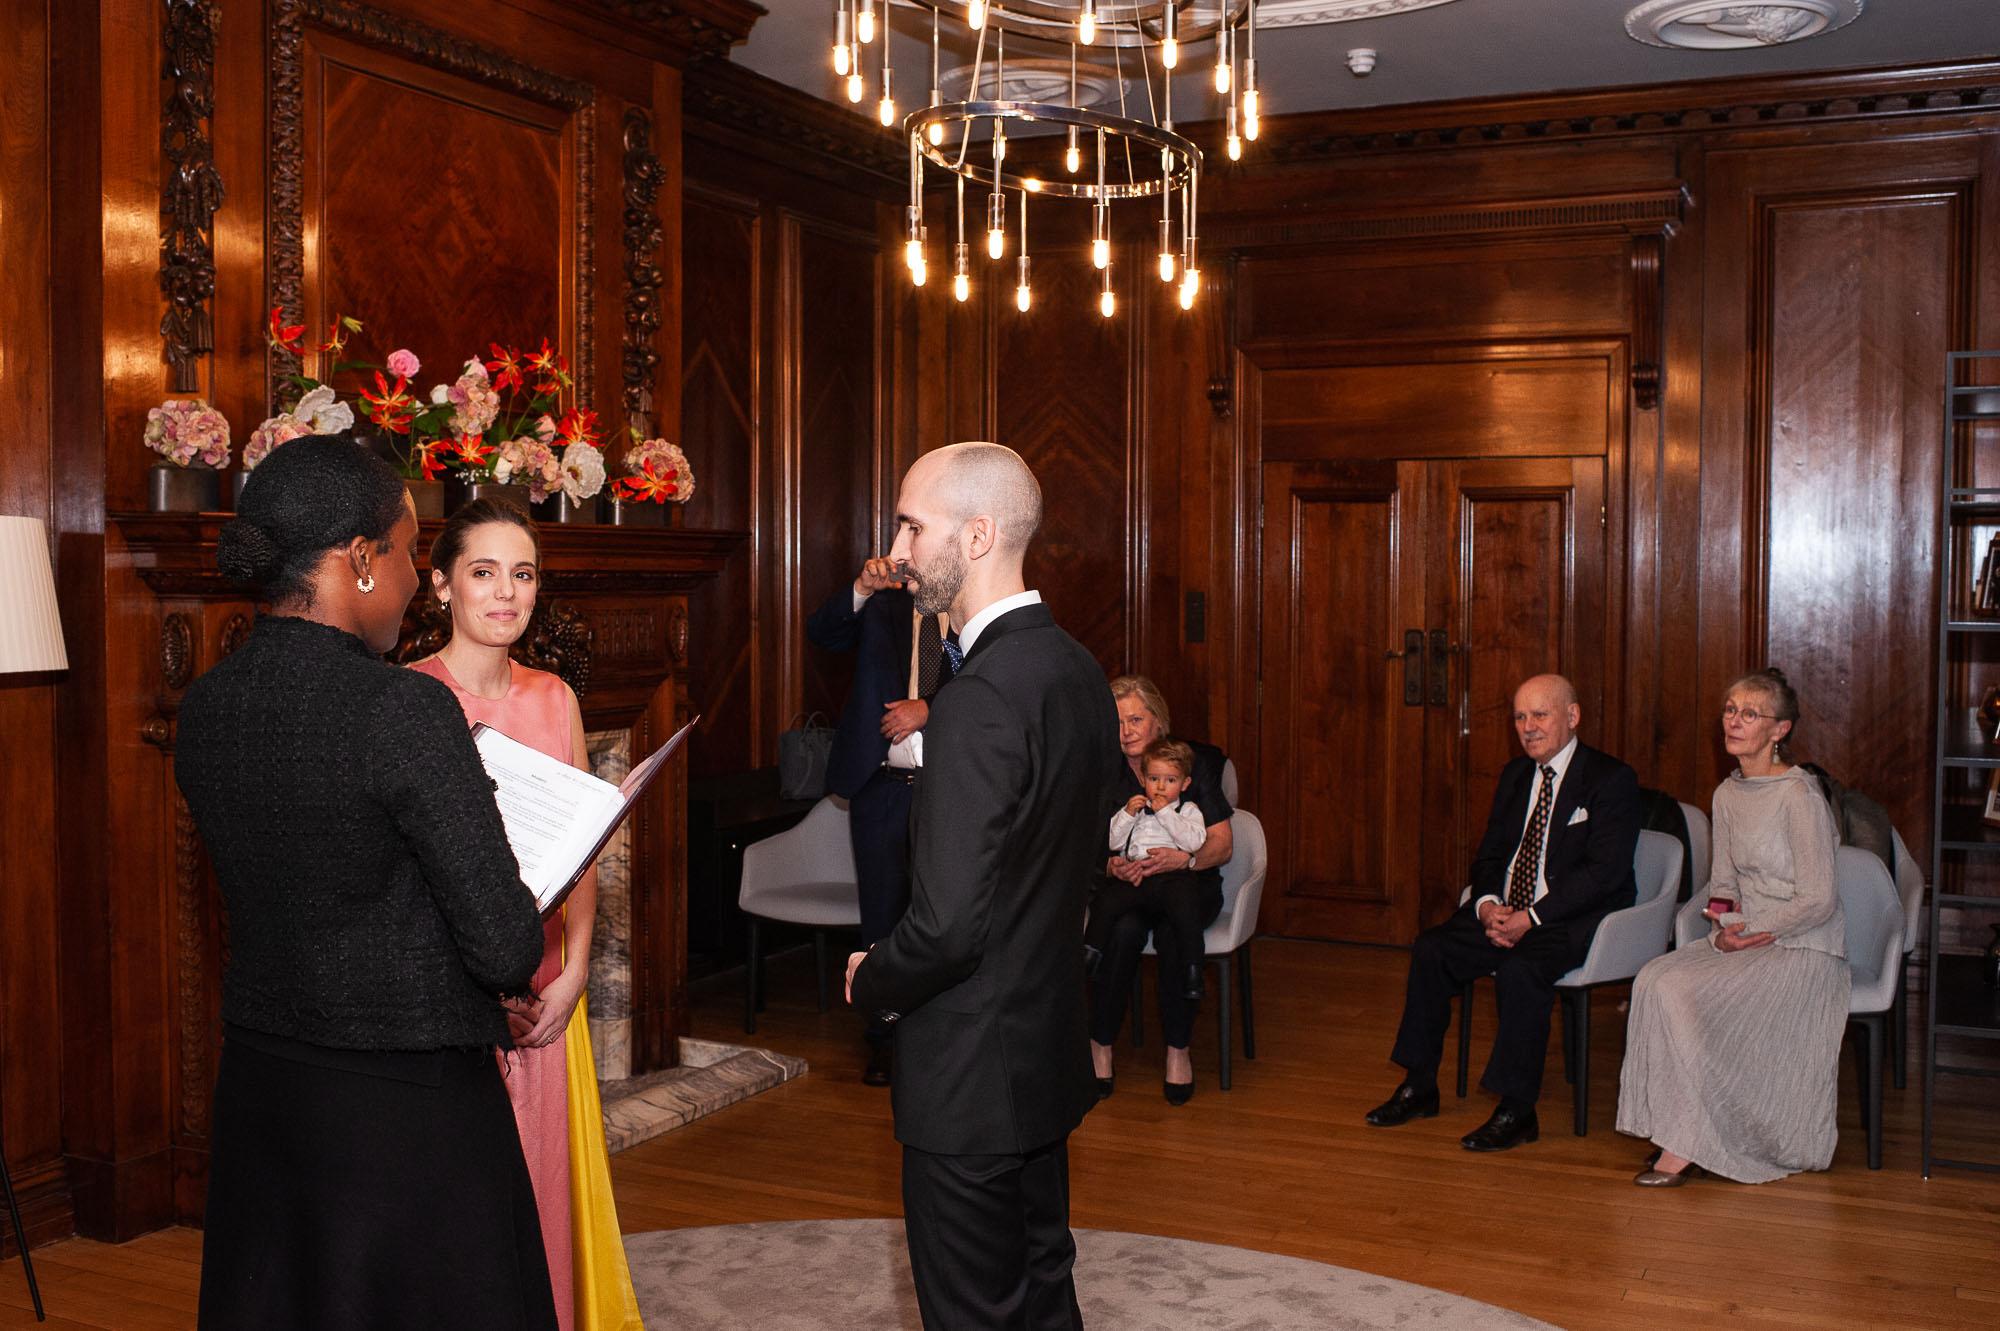 Our Wedding_HR (125 of 176).jpg